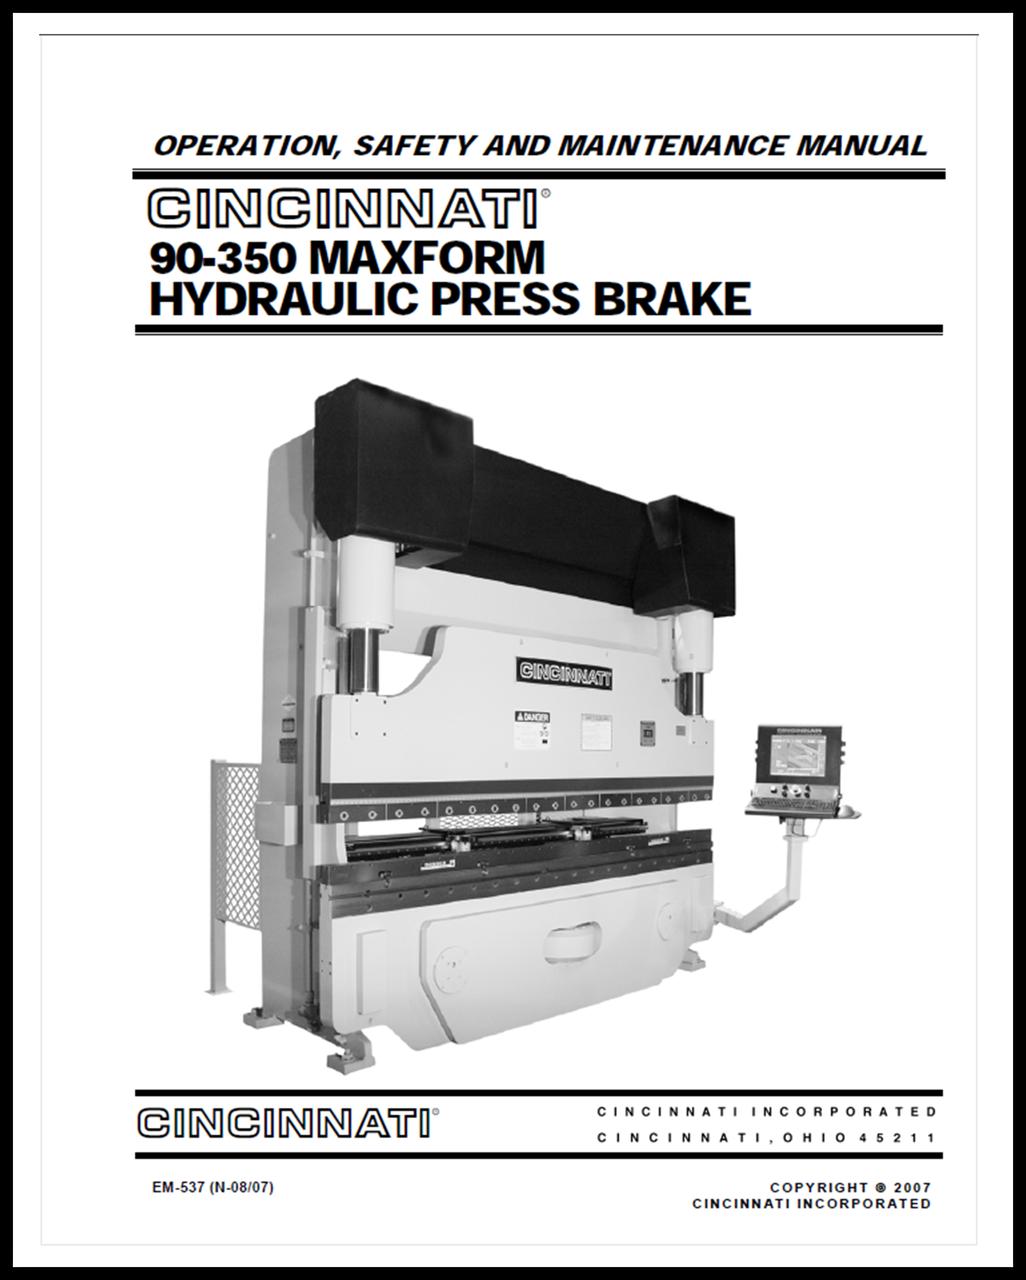 EM-537 (N-08-07) 90-350 MAXFORM HYDRAULIC PRESS BRAKE OPERATION, SAFETY AND MAINTENANCE MANUAL